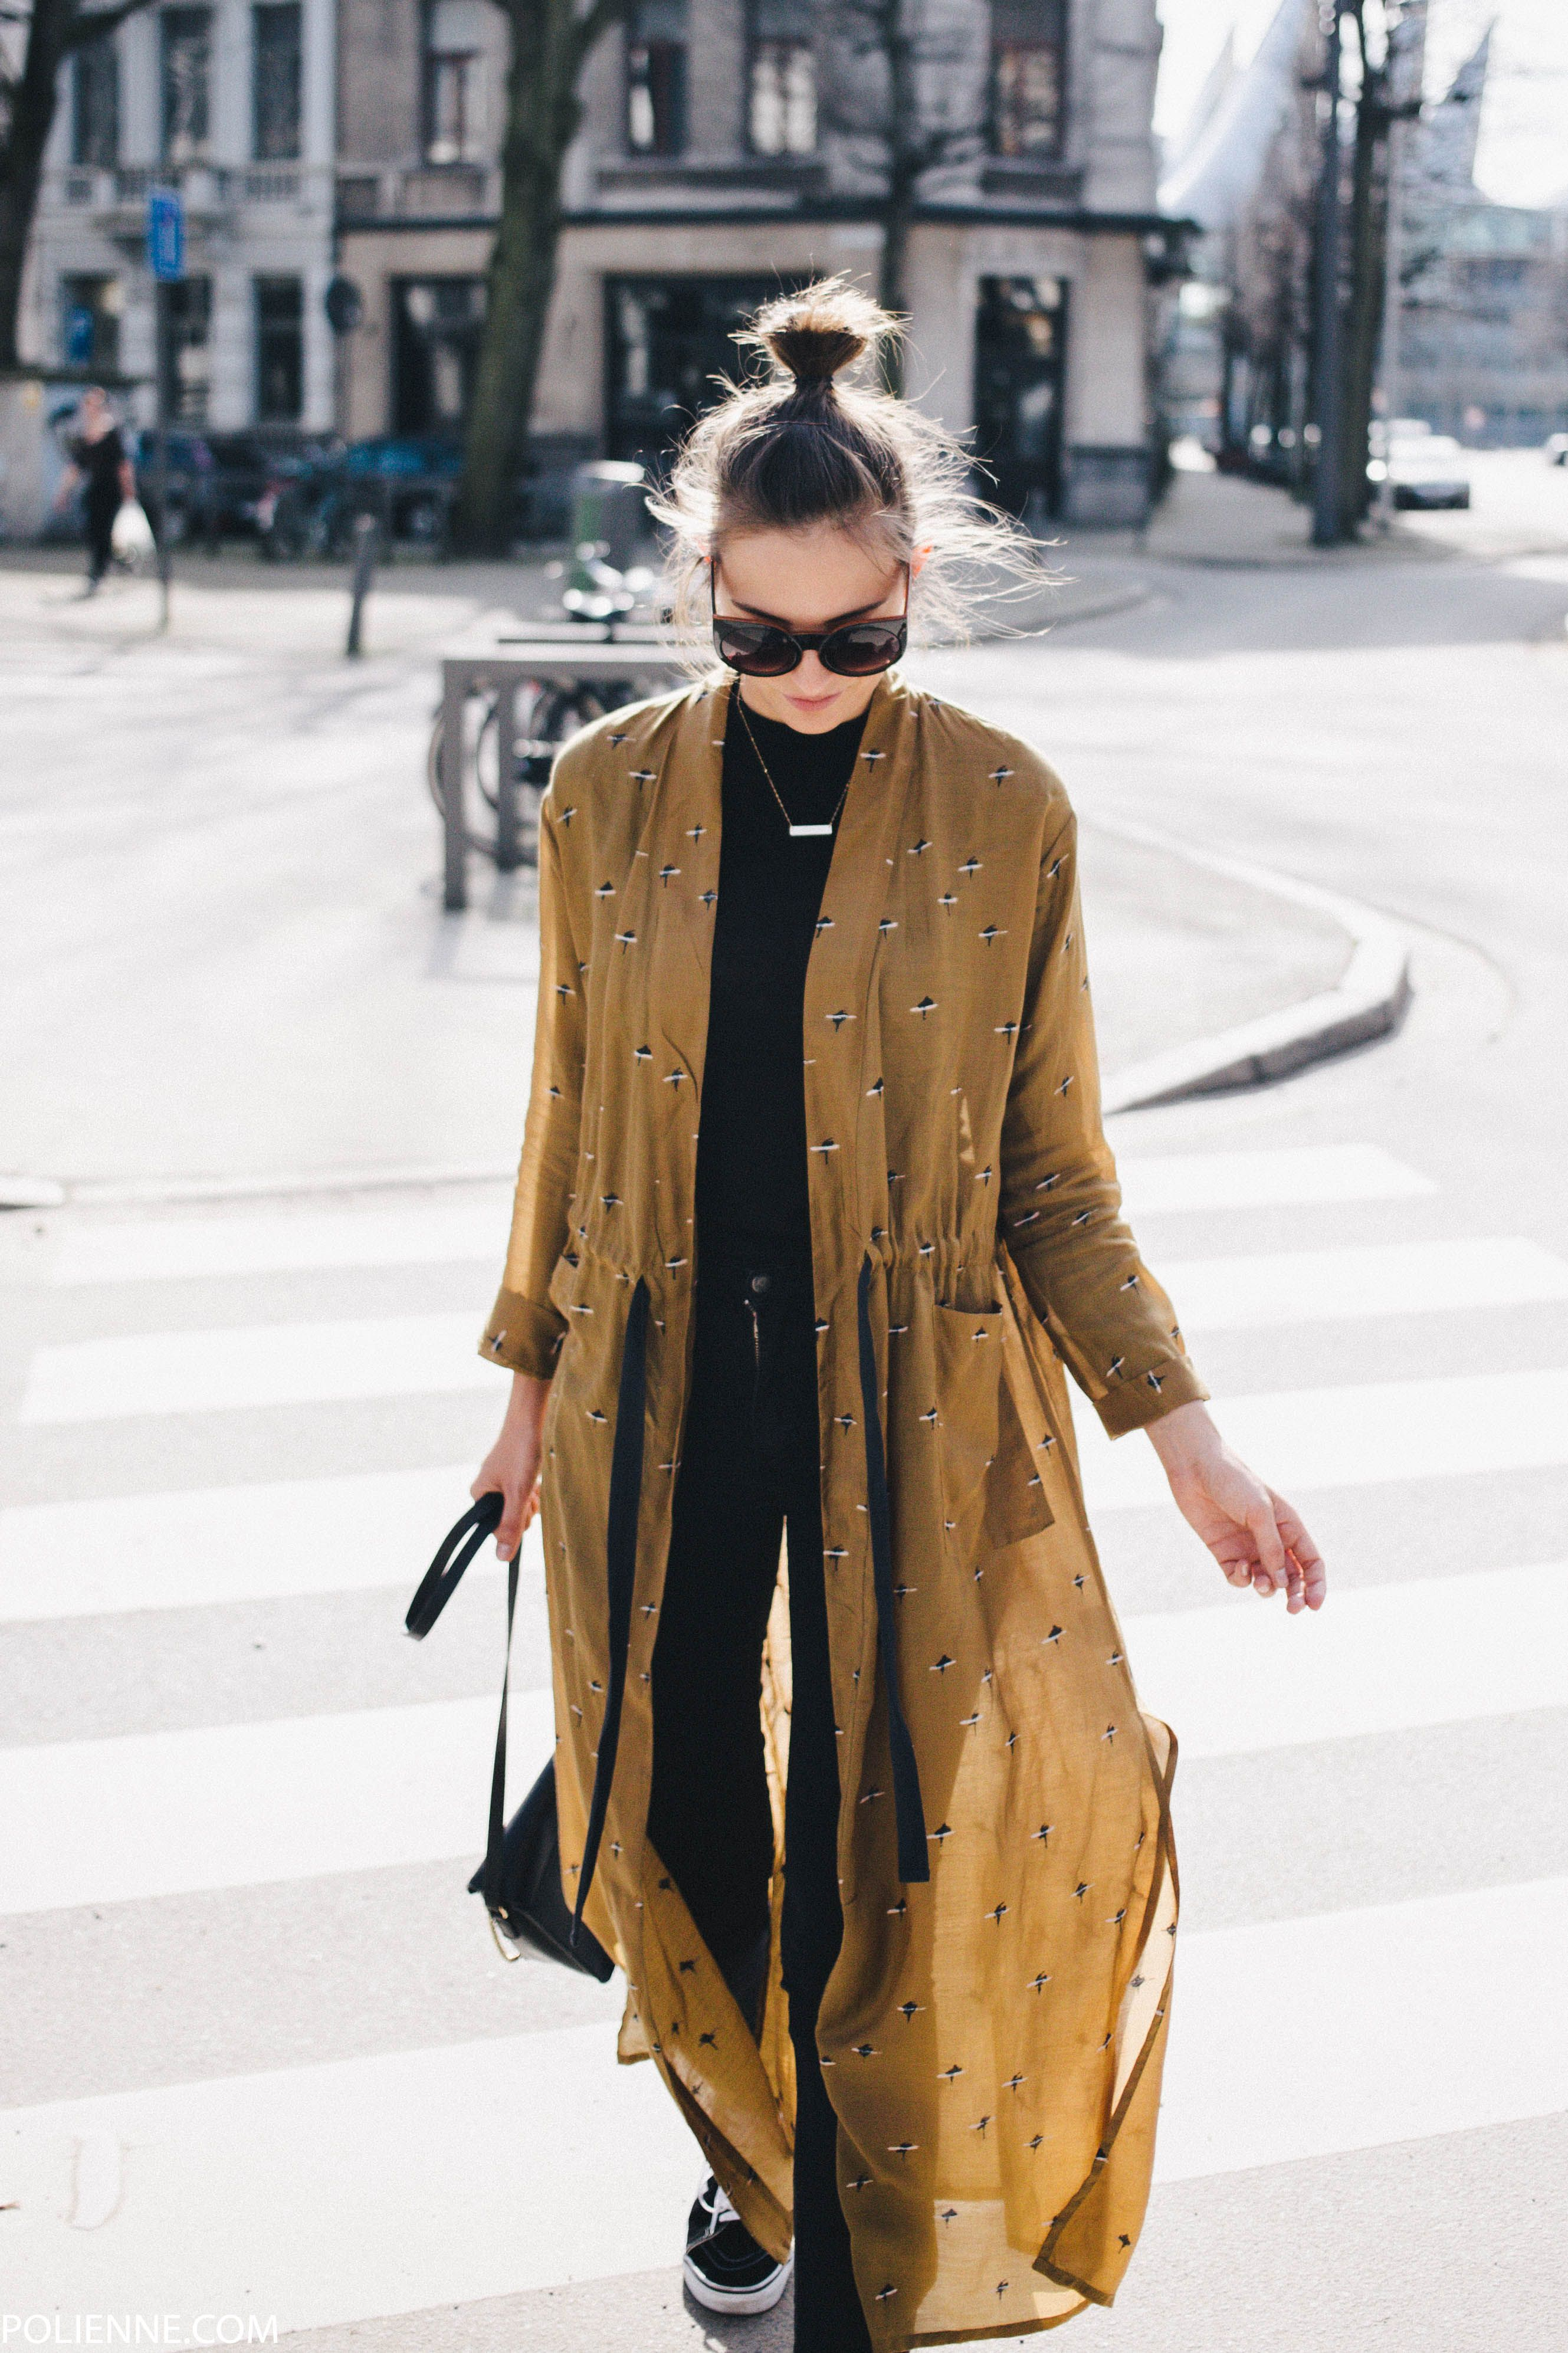 POLIENNE by Paulien Riemis | wearing a SISSY BOY kimono, CHEAP MONDAY  skinny jeans,